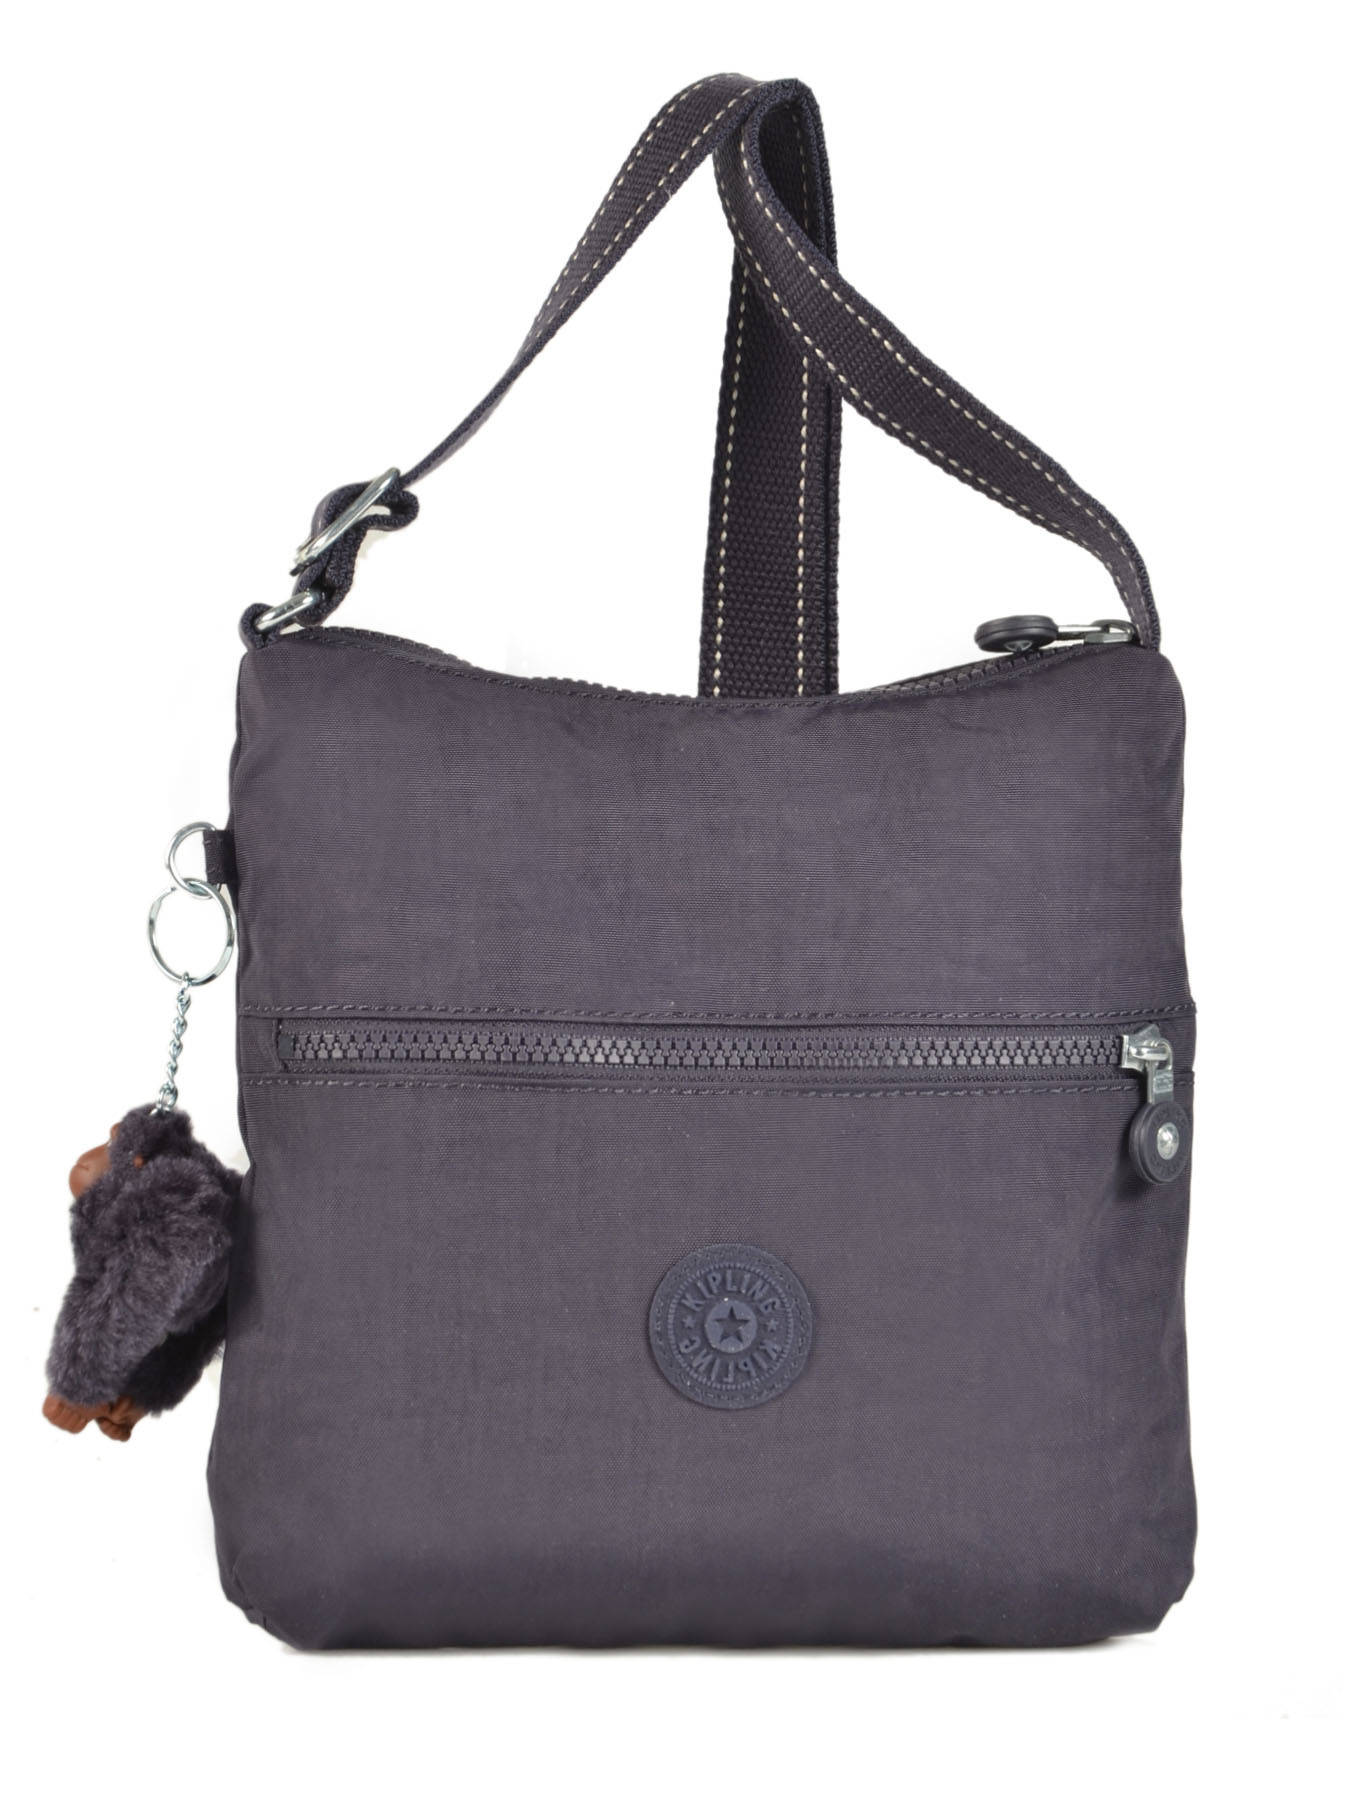 Grand Sac Bandouliere Kipling : Sac kipling basic blur purple en vente au meilleur prix